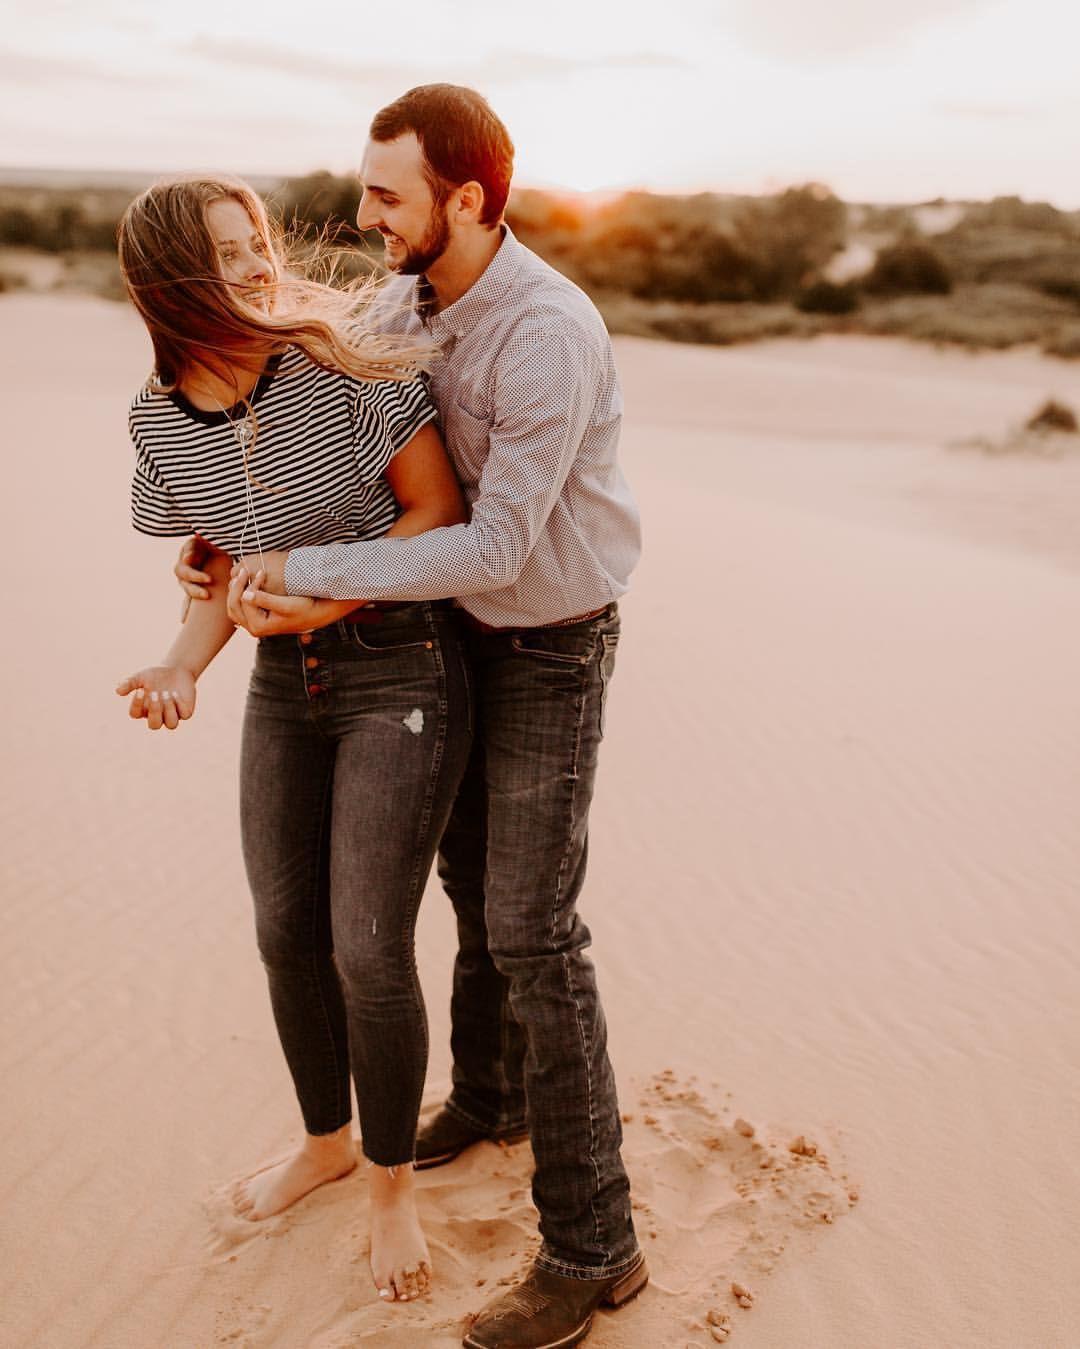 Oklahoma dating wetten